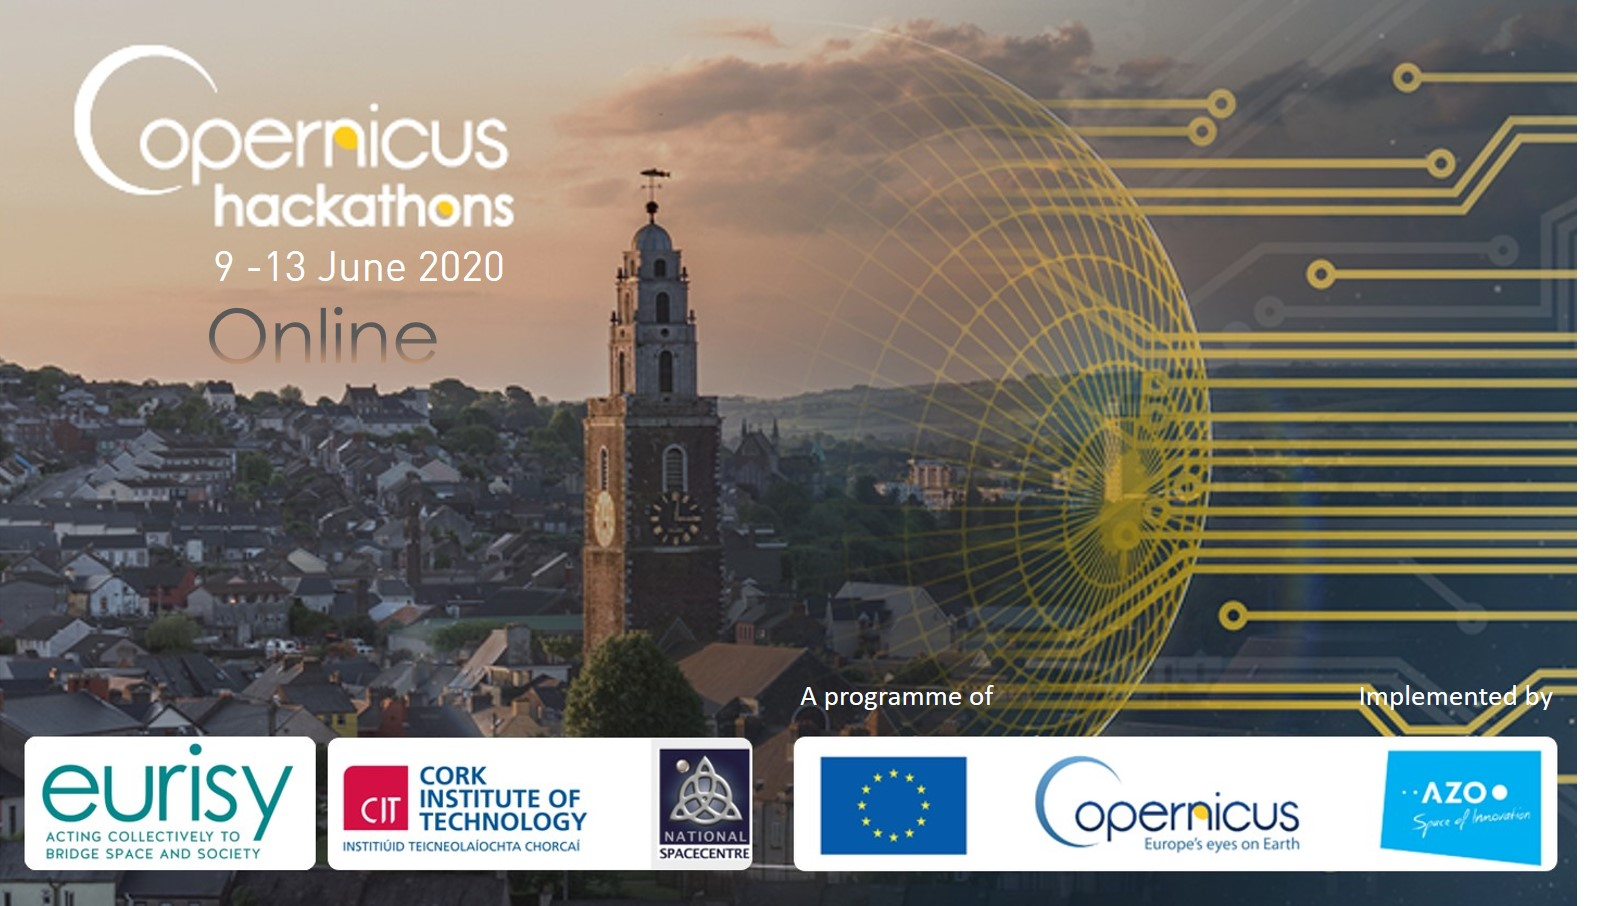 Copernicus Hackathon Cork